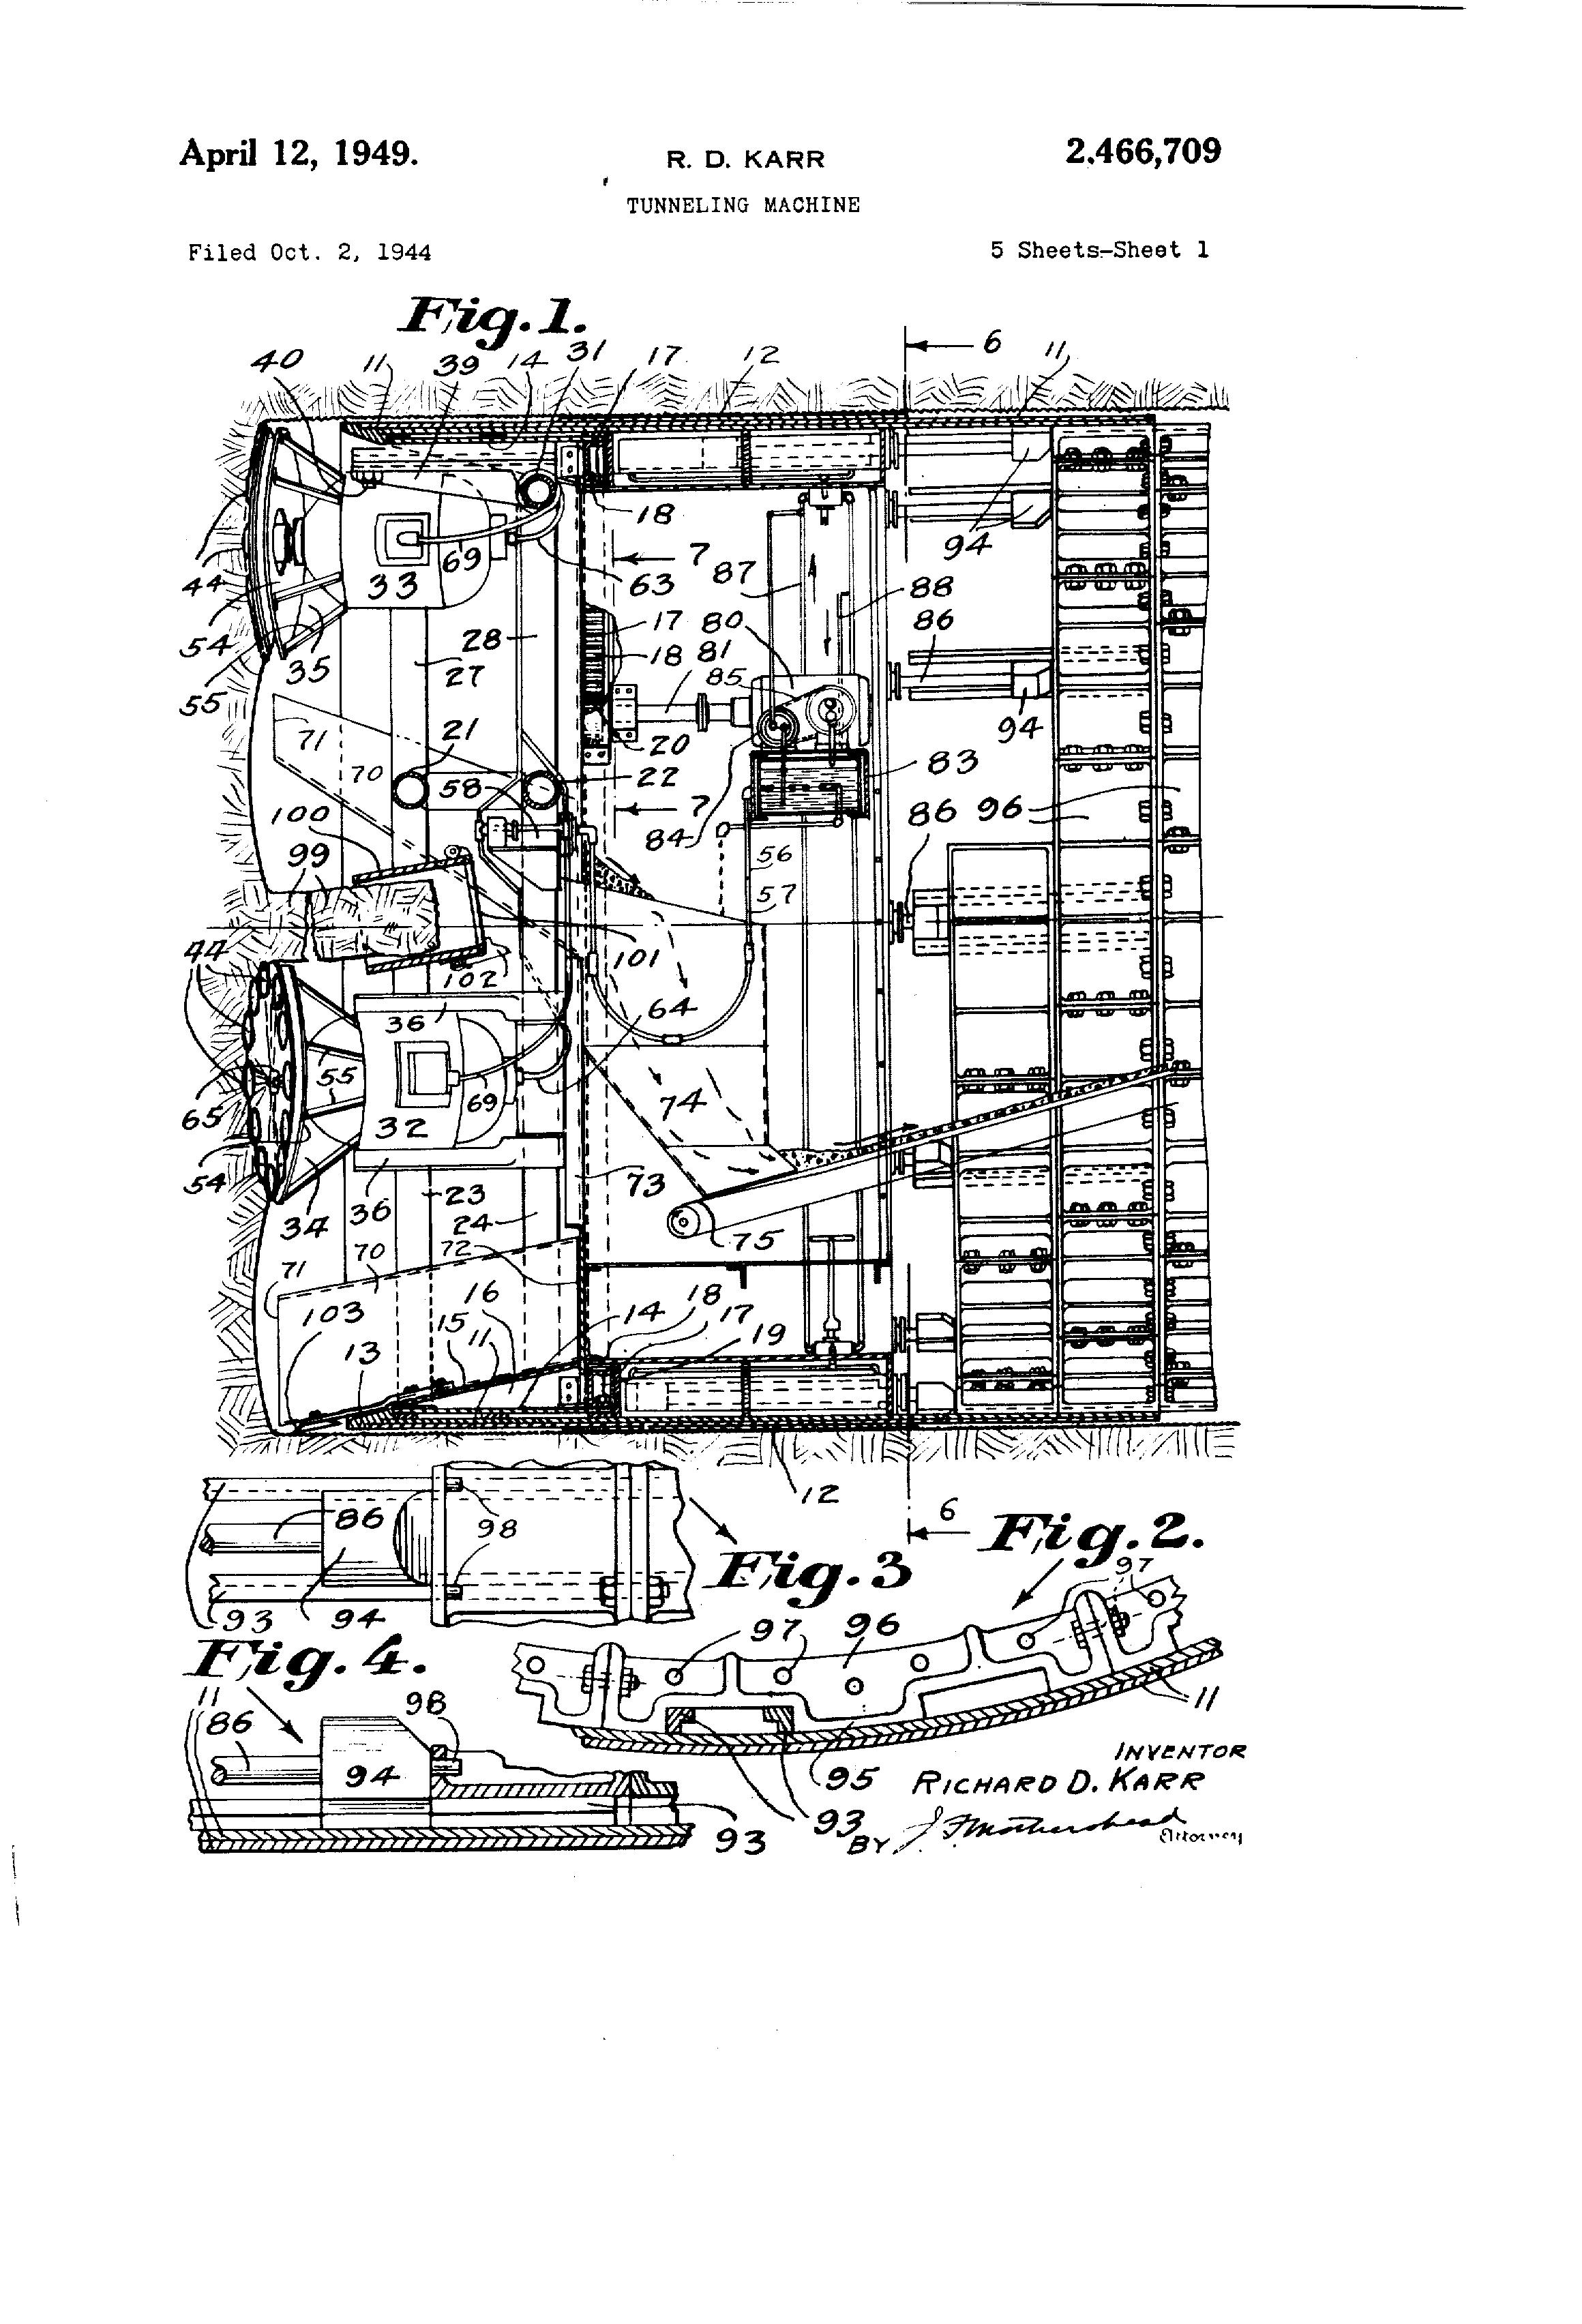 Ingersoll Rand 2475n7 5 Wiring Diagram Gandul 457779119 – Ingersoll Rand 185 Wiring Diagram